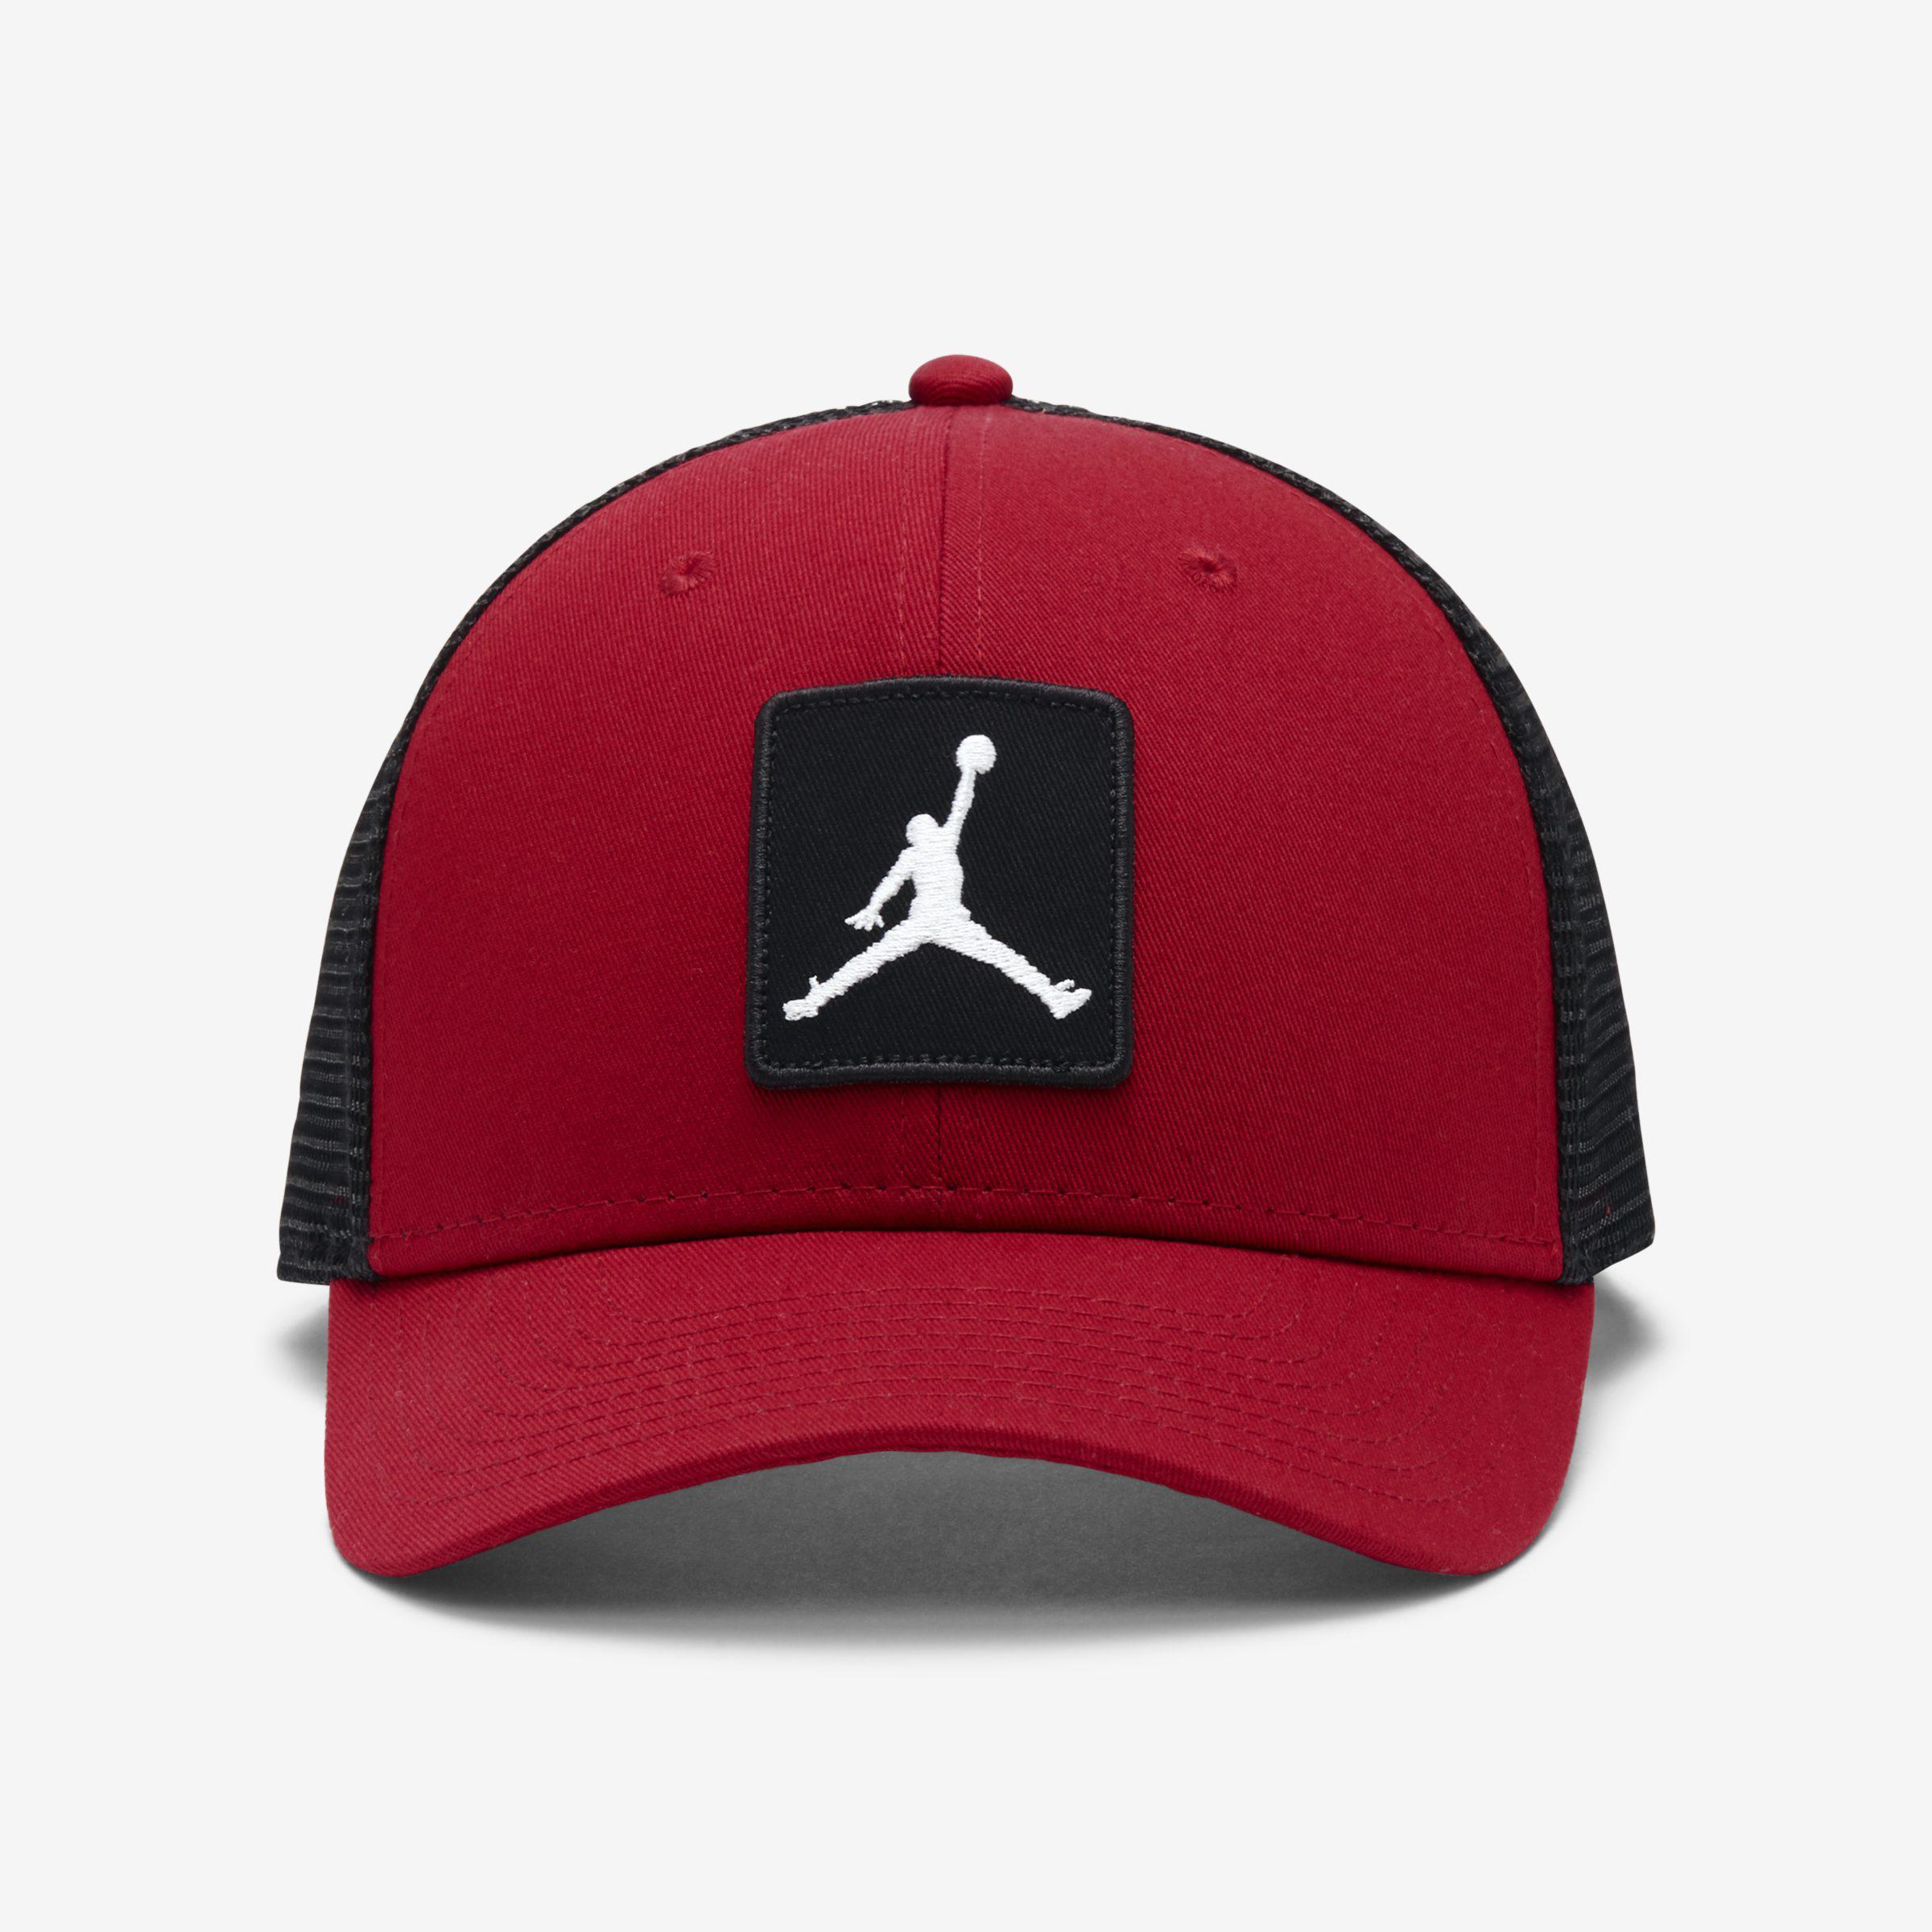 059069551a773 Nike Jordan Jumpman Classic99 Trucker Adjustable Hat in Red for Men ...